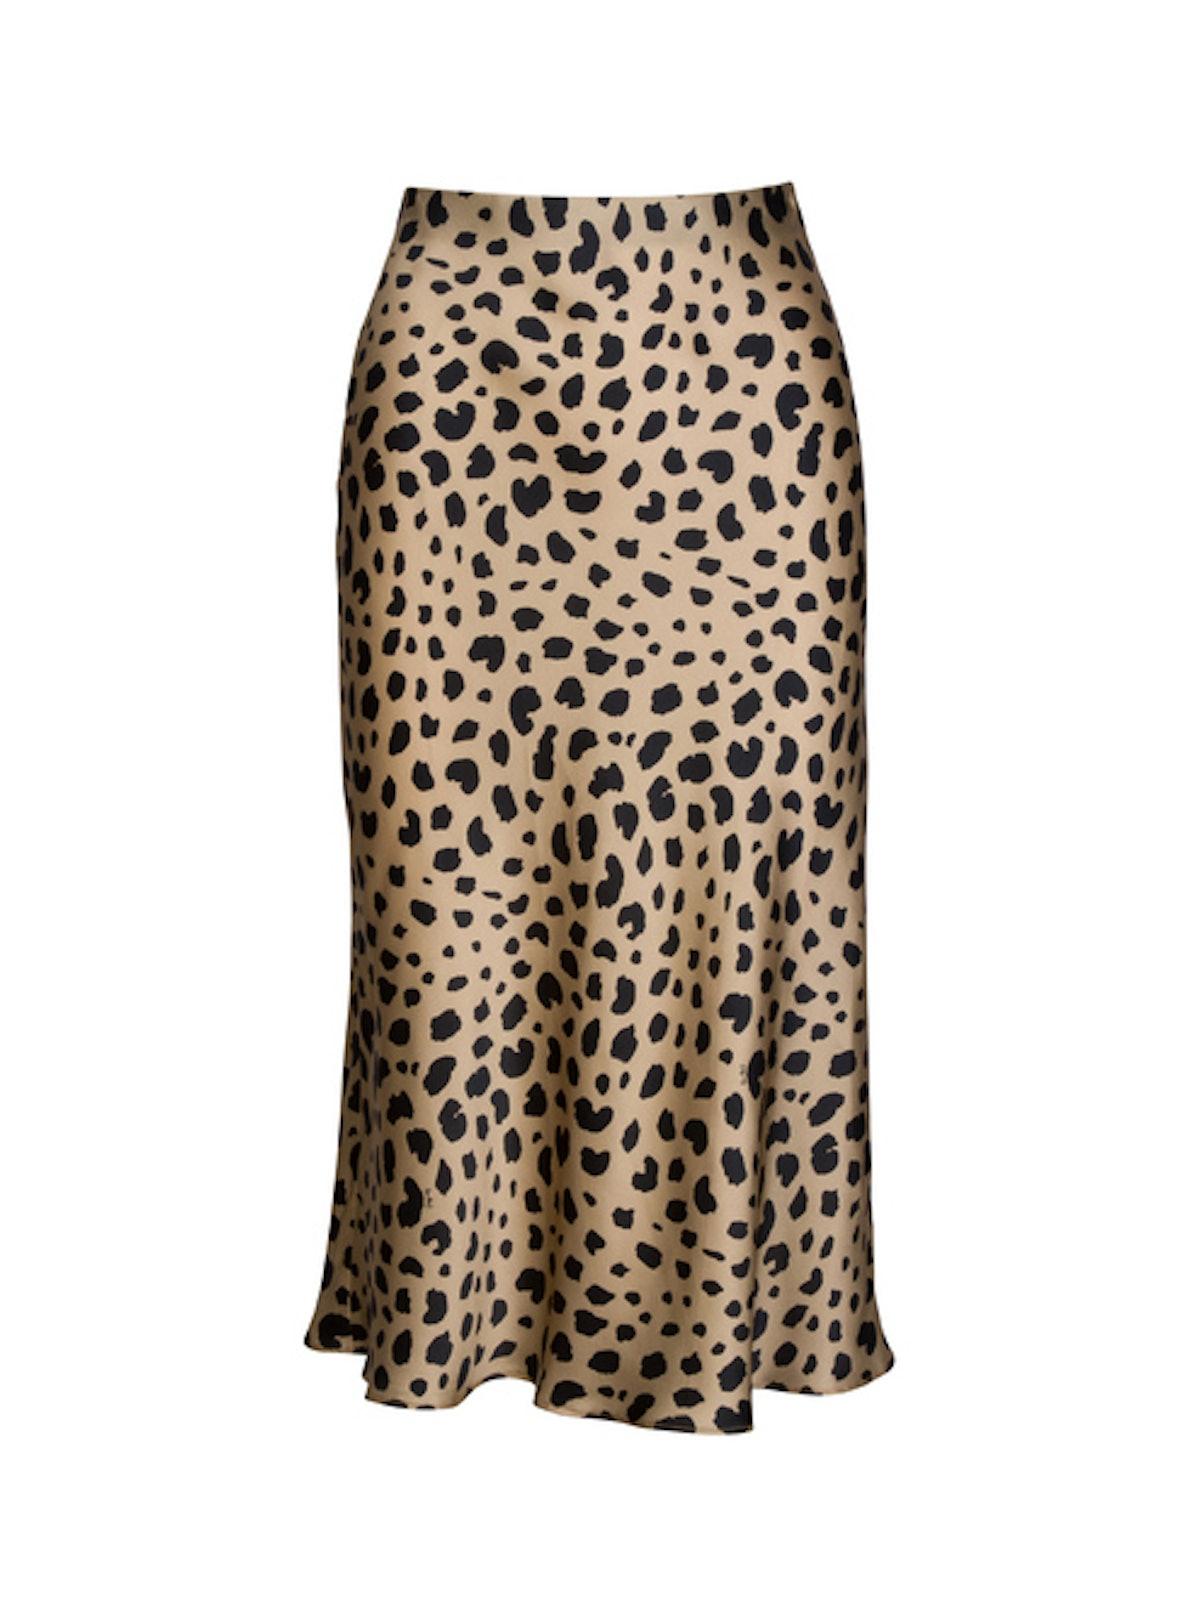 The Naomi Skirt